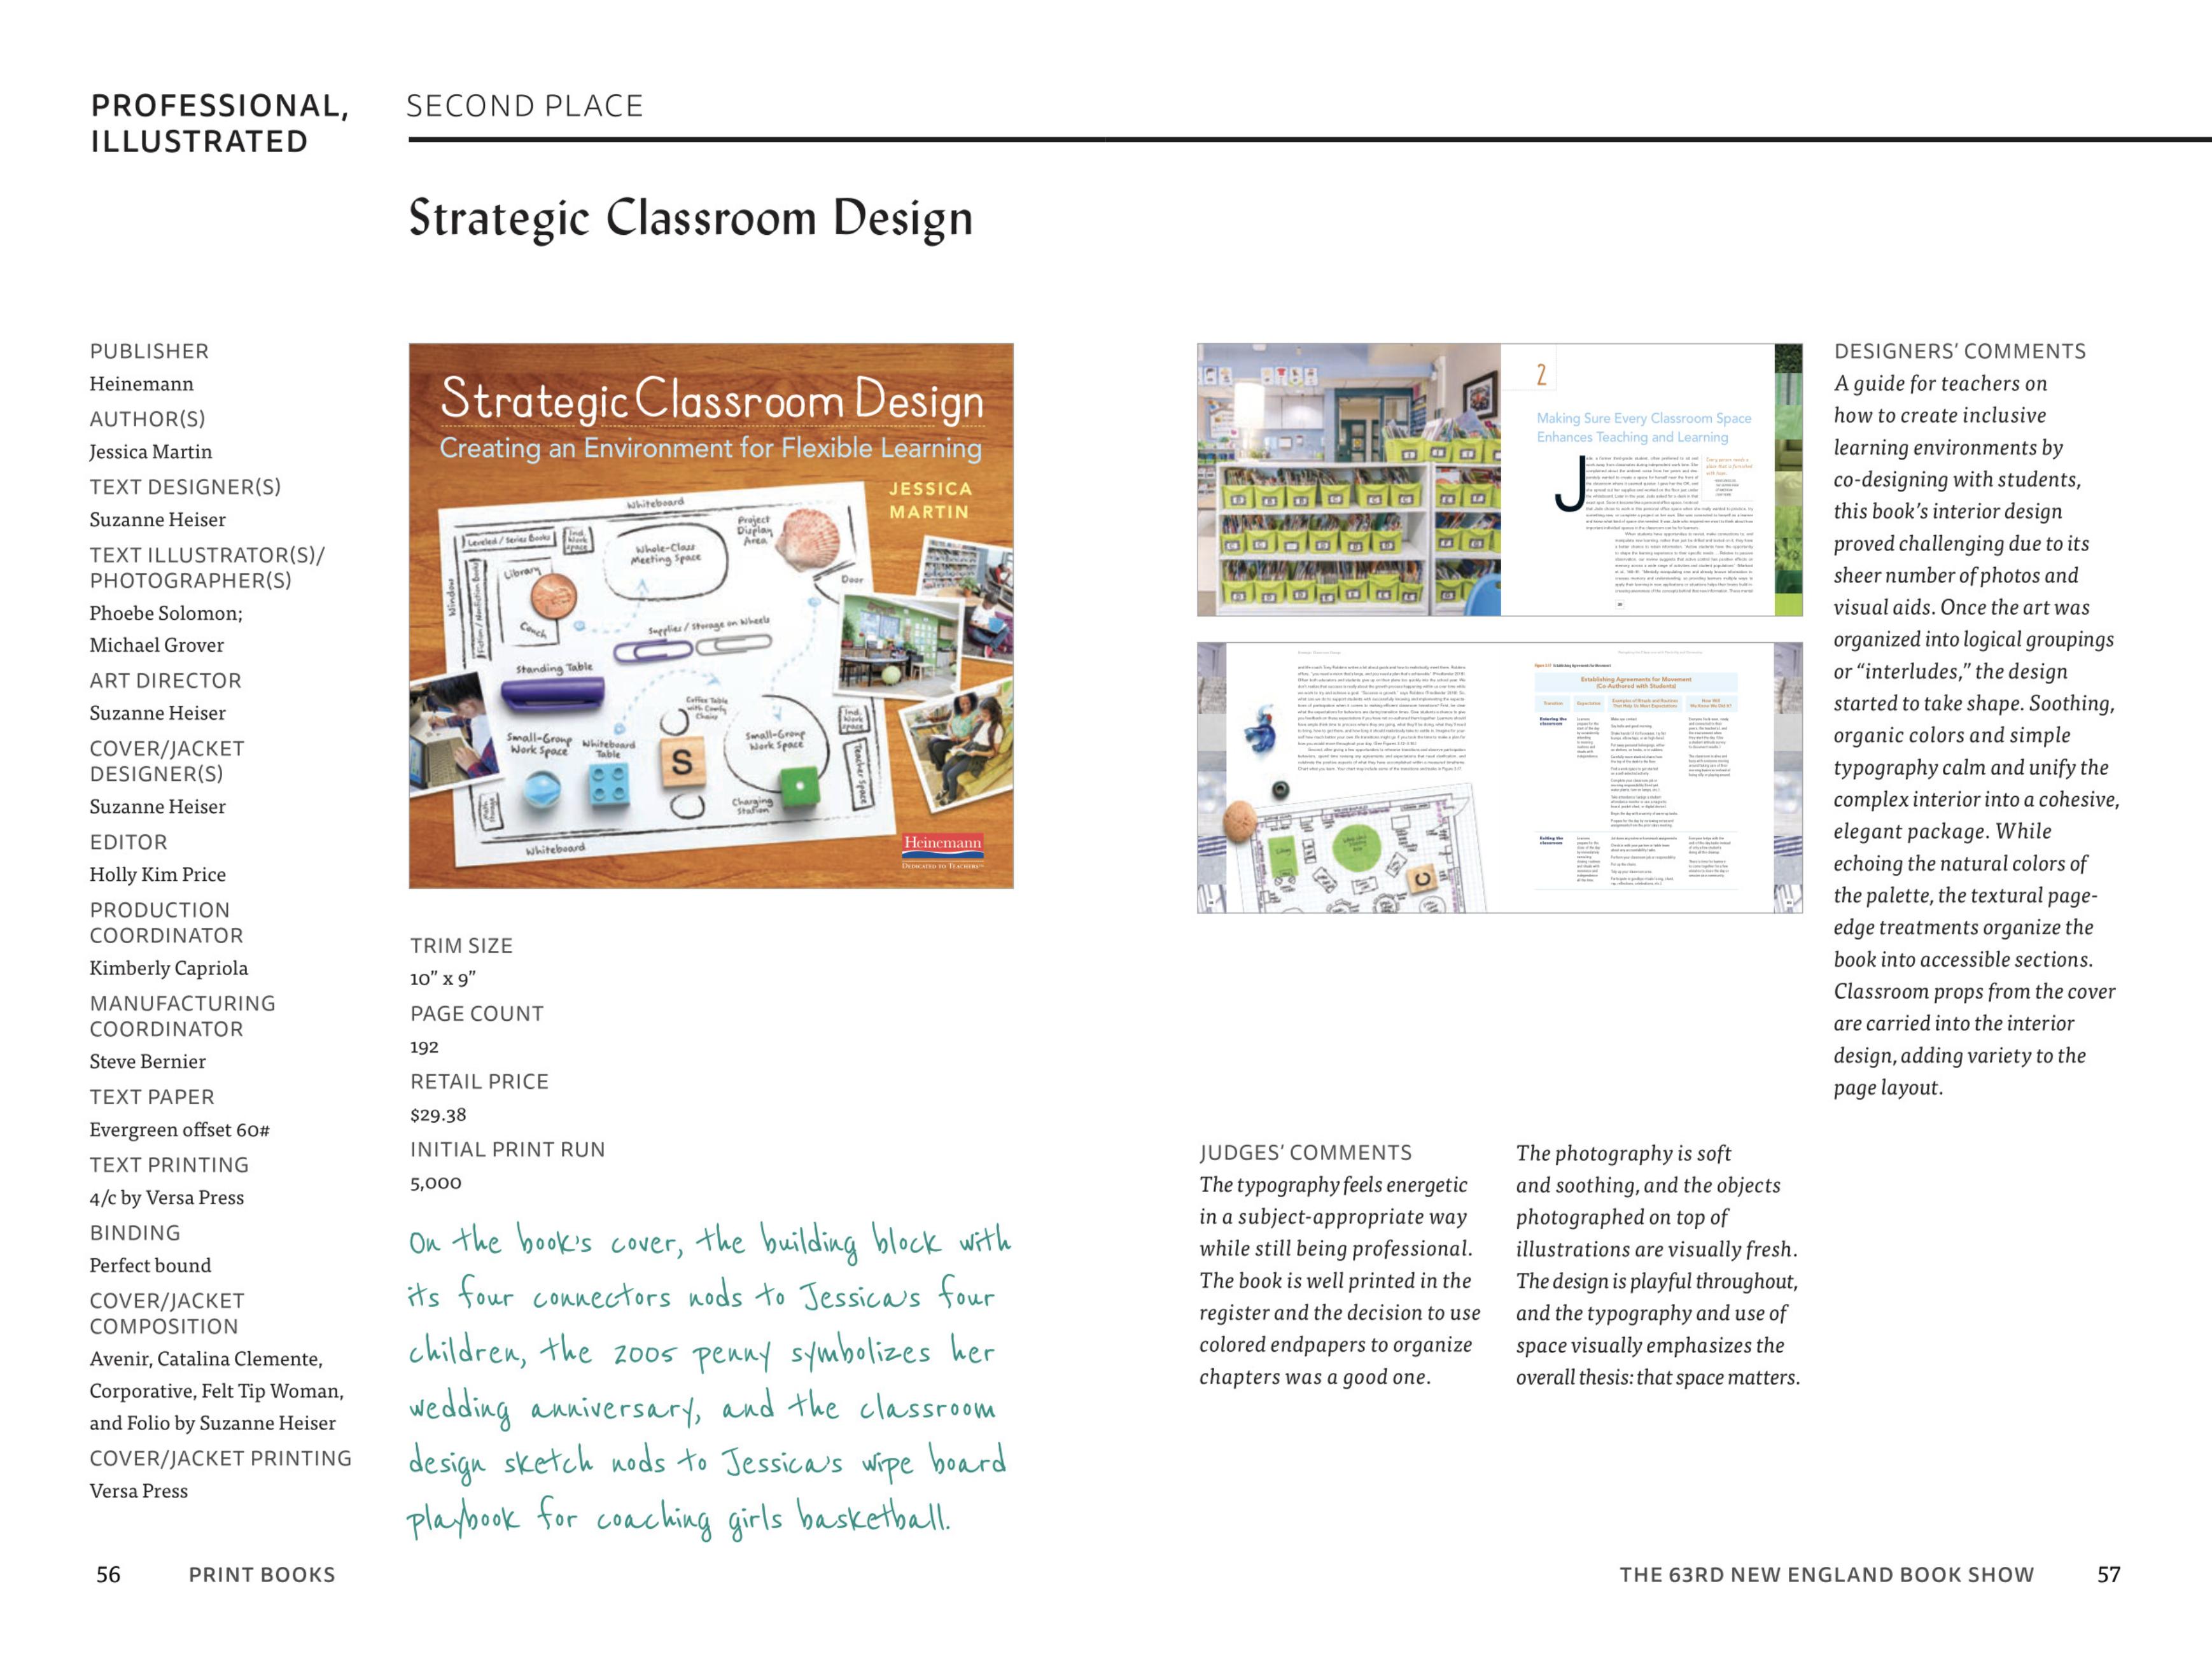 NEBS Strategic Classroom Design